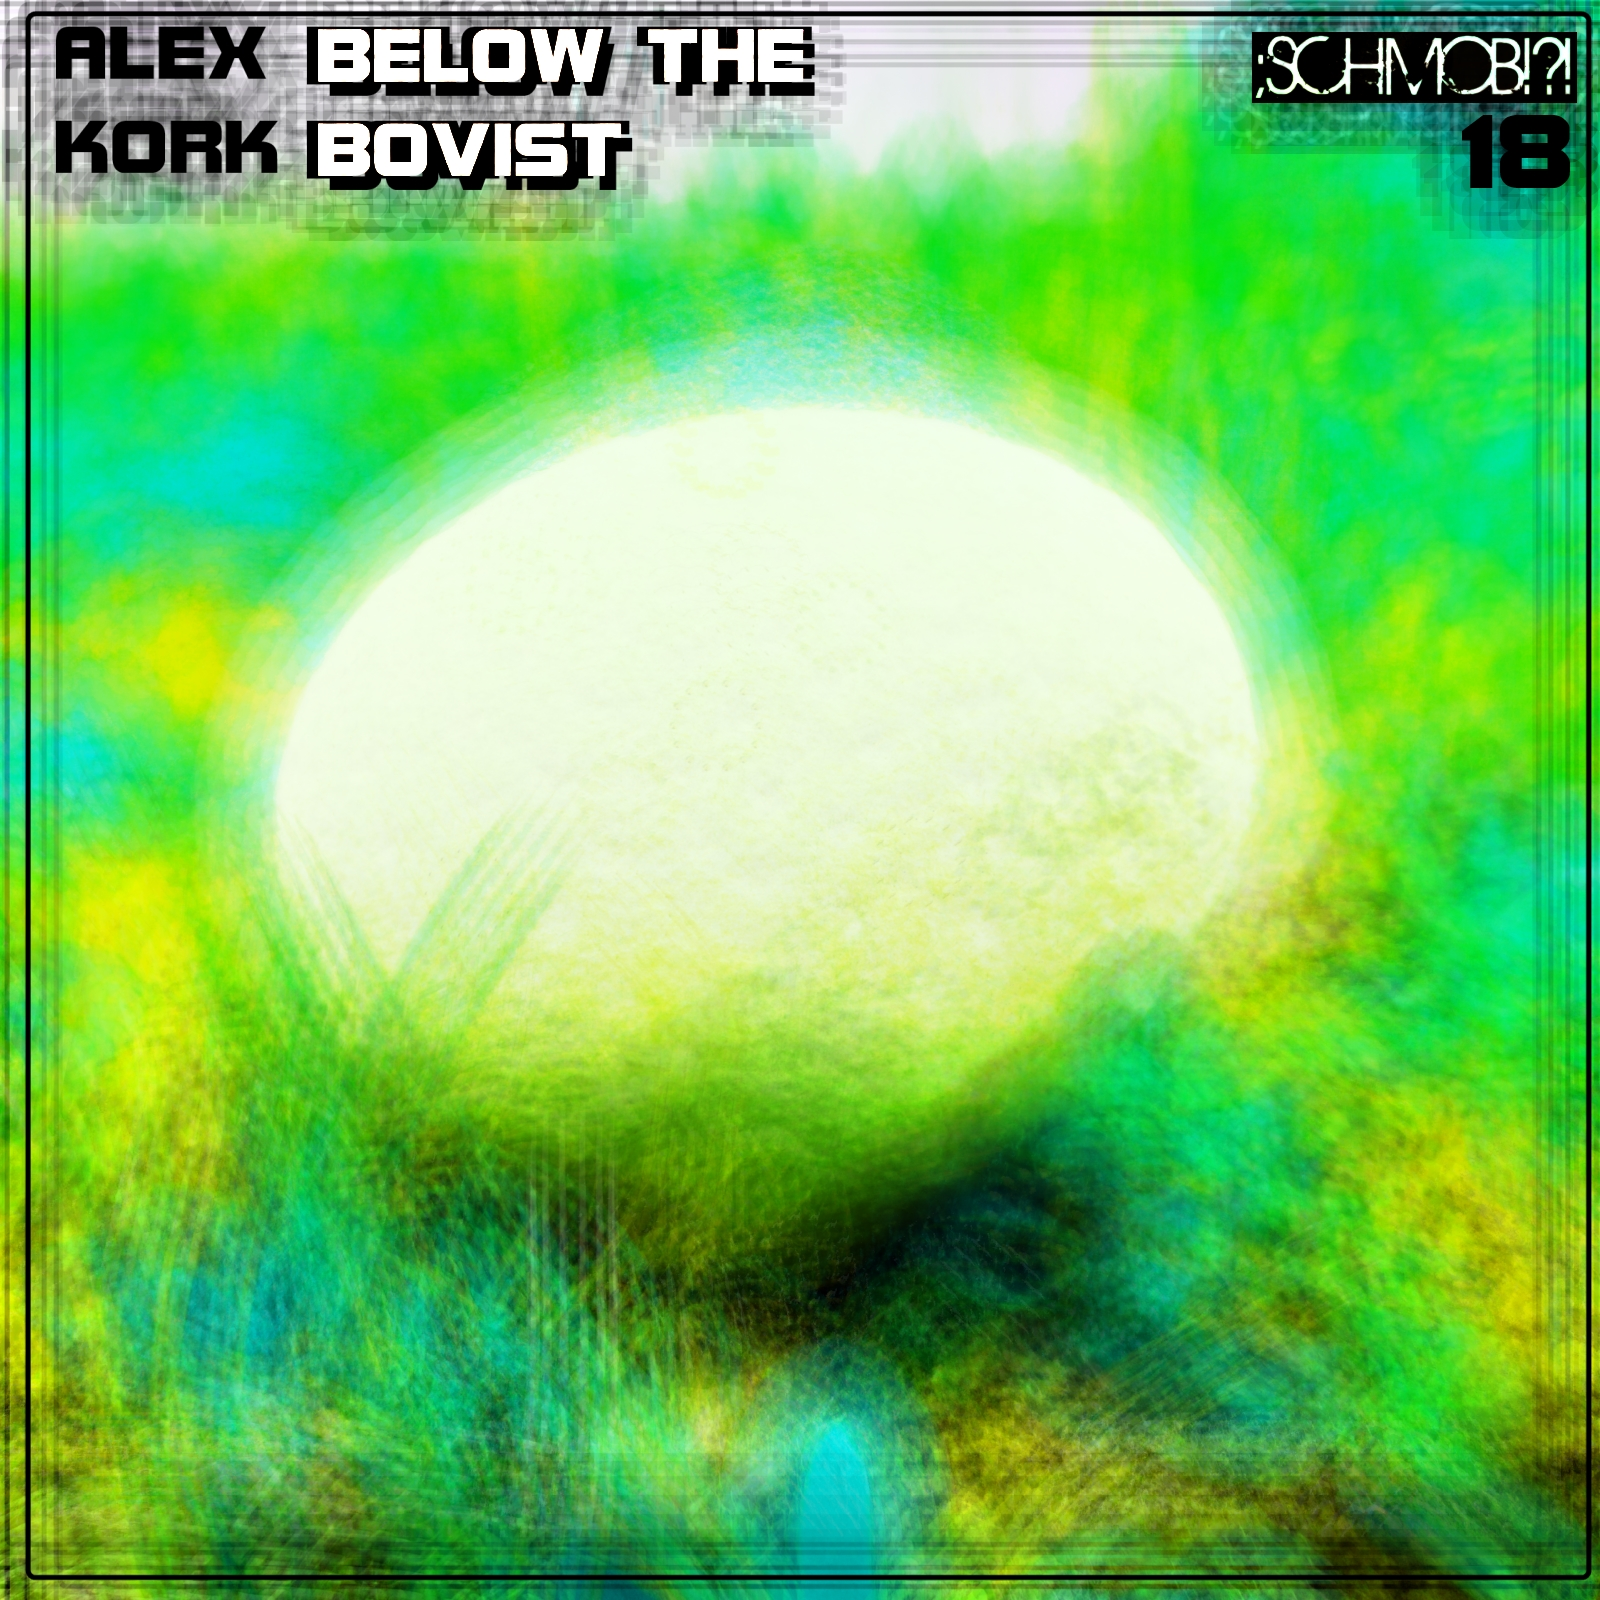 Alex Kork – Below the bovist